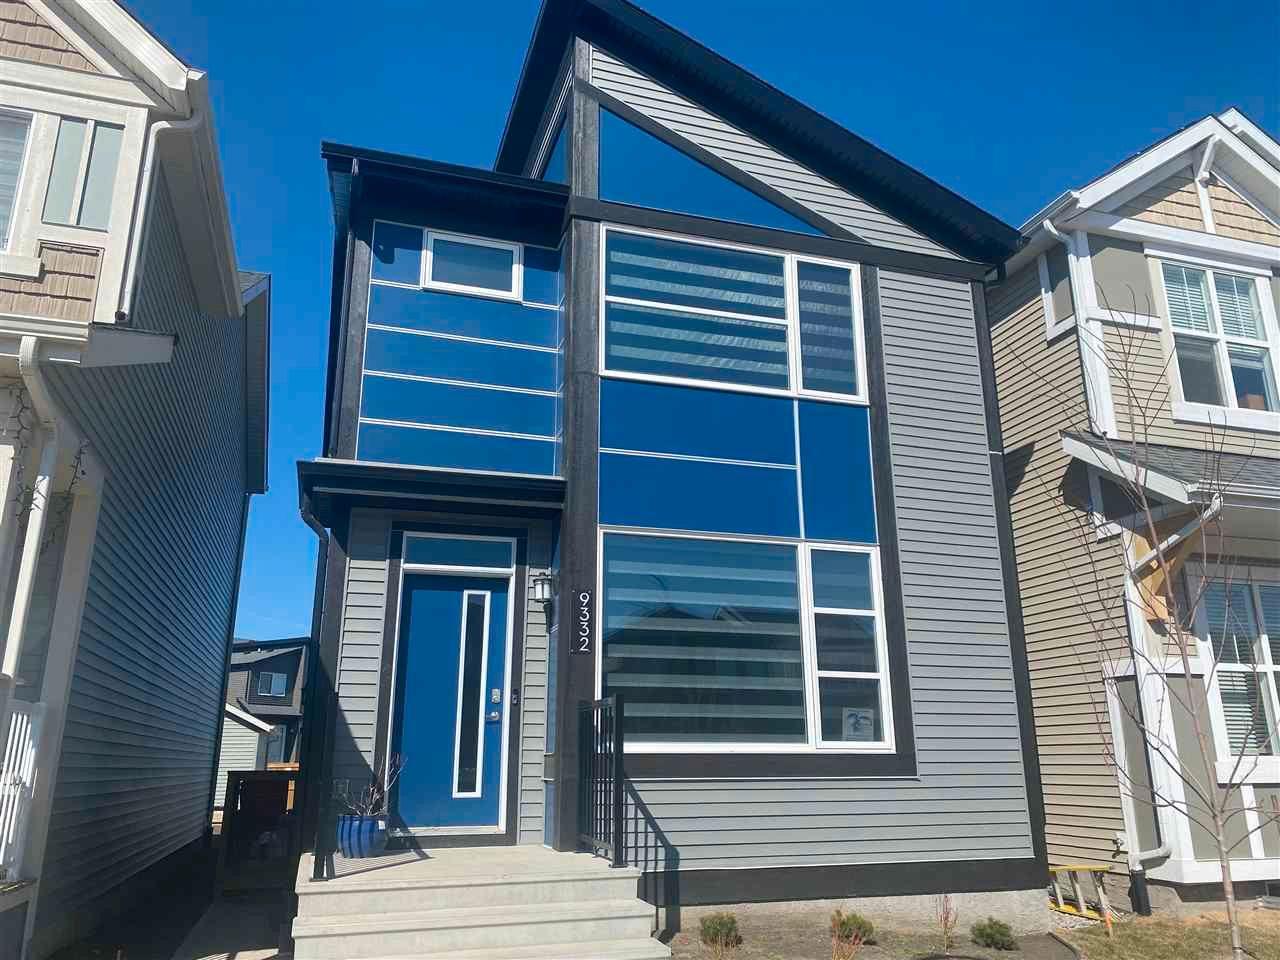 Main Photo: 9332 223 Street in Edmonton: Zone 58 House for sale : MLS®# E4240482